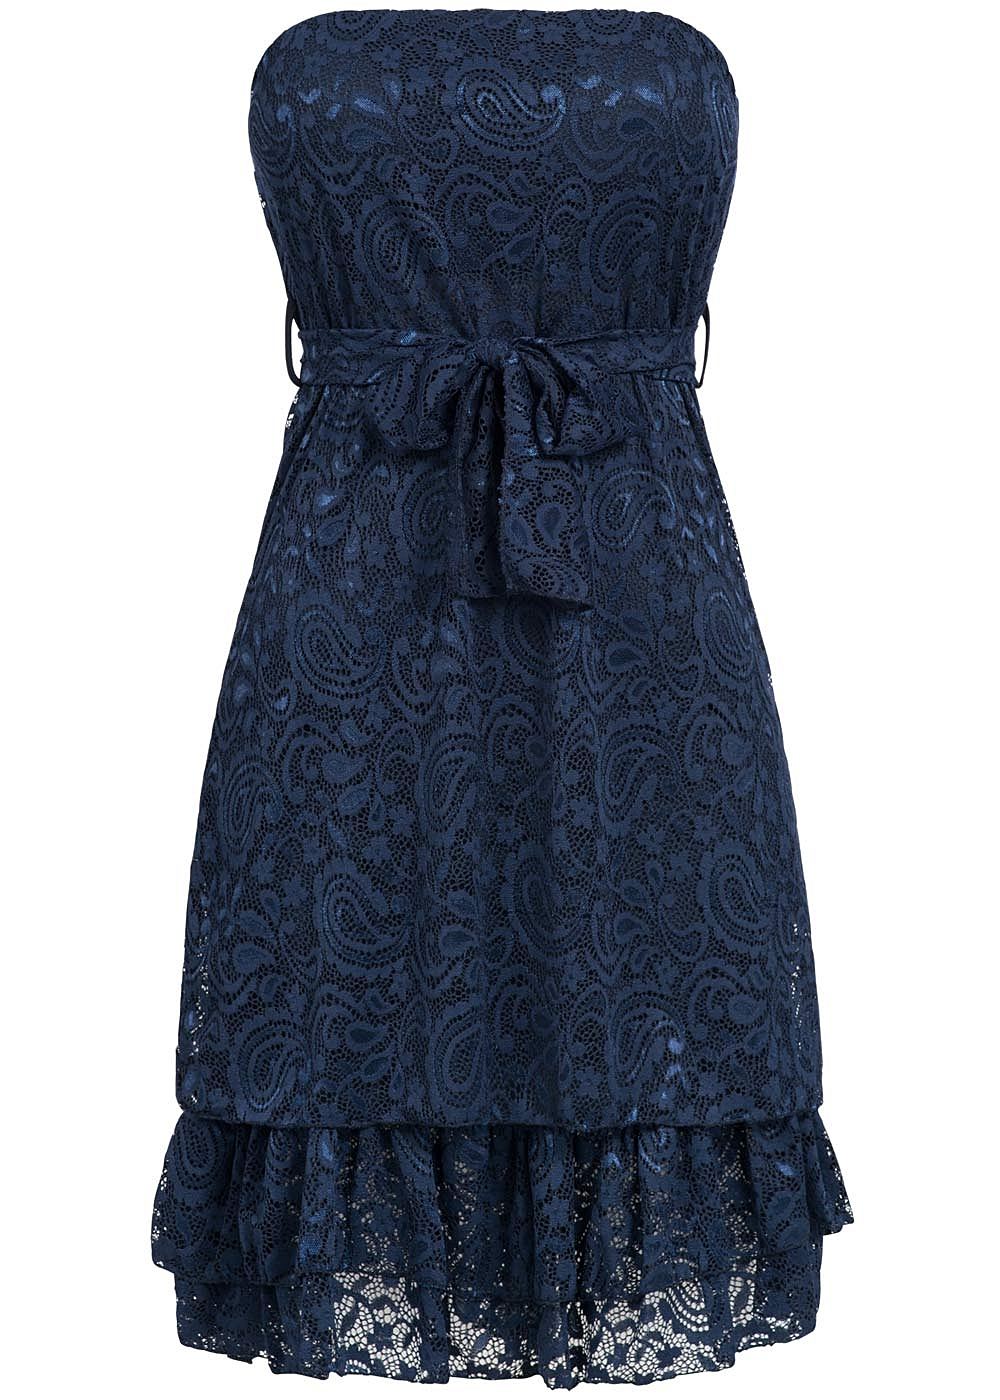 Styleboom Fashion Damen Mini Bandeau Kleid Spitze Allover ...